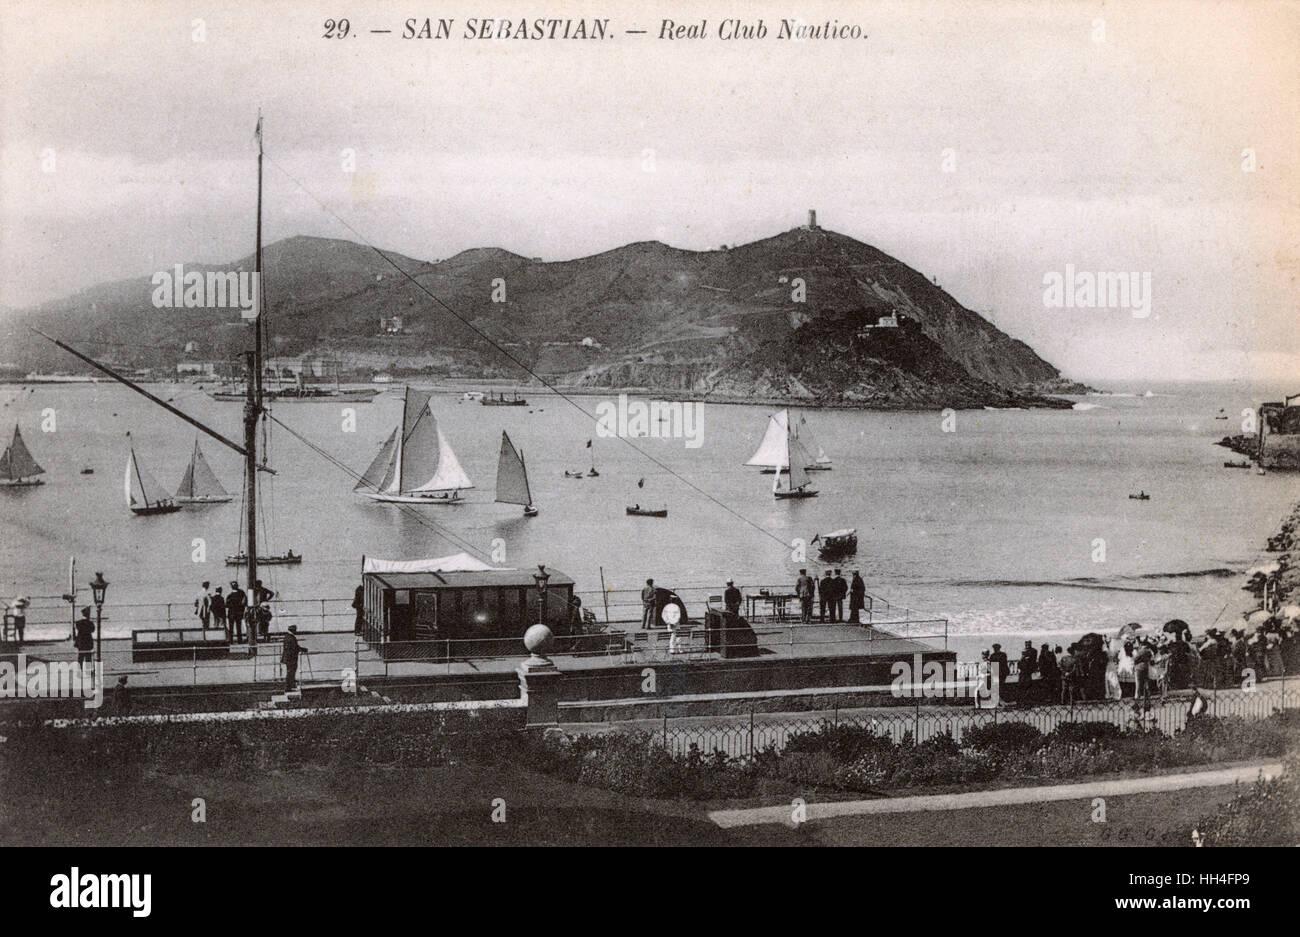 San Sebastian, Basque Region, Spain - Royal Nautical Club - Stock Image